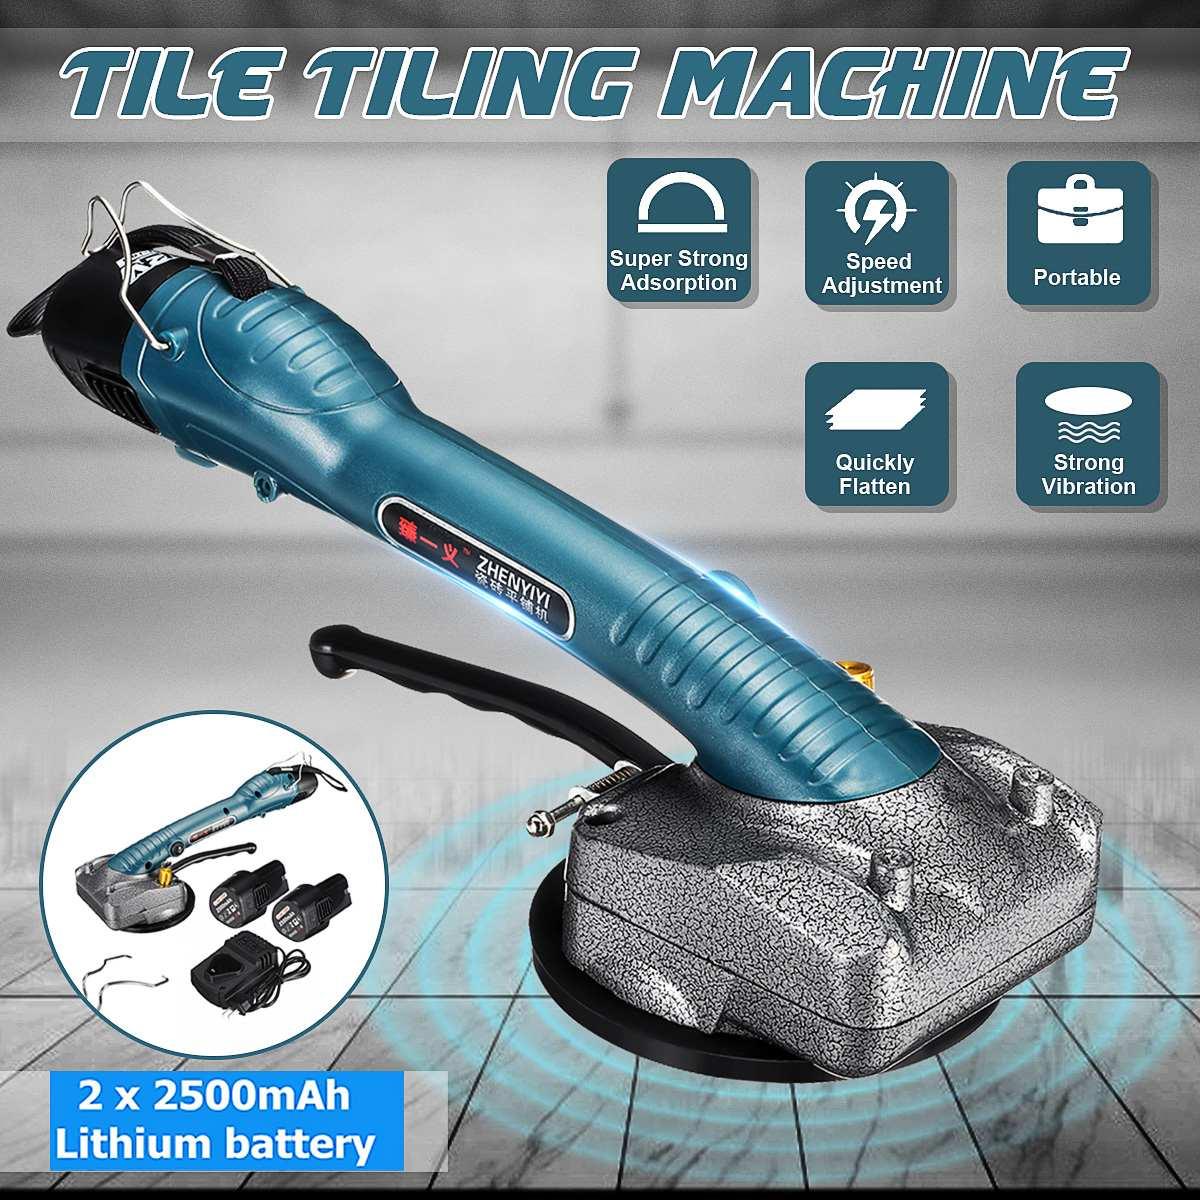 600W Tile Machine Vibrators High Power Tile Tiling Machine Electric Floor Tile Vibrator Tiling Tile Tool+2pcs 2500mAh Batteries